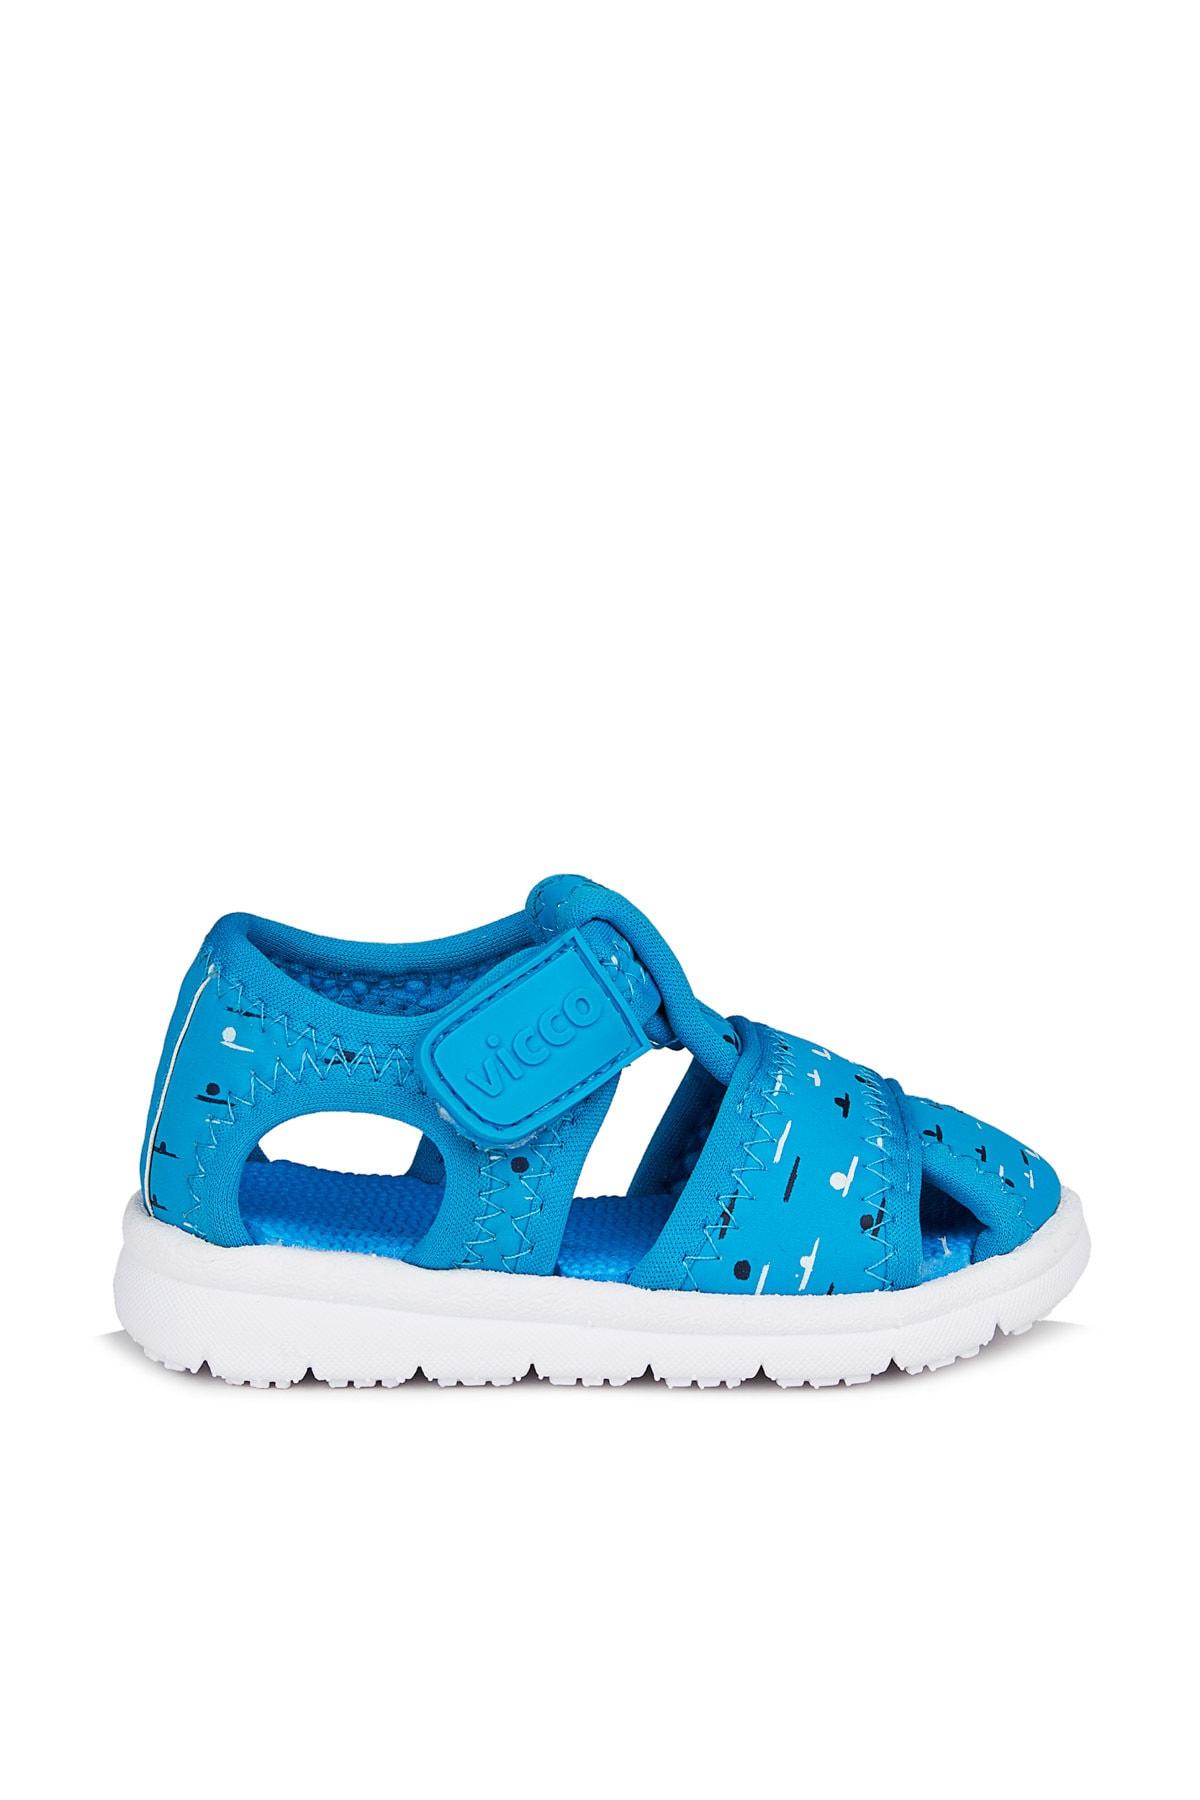 Vicco Bumba Erkek Bebe Mavi Sandalet